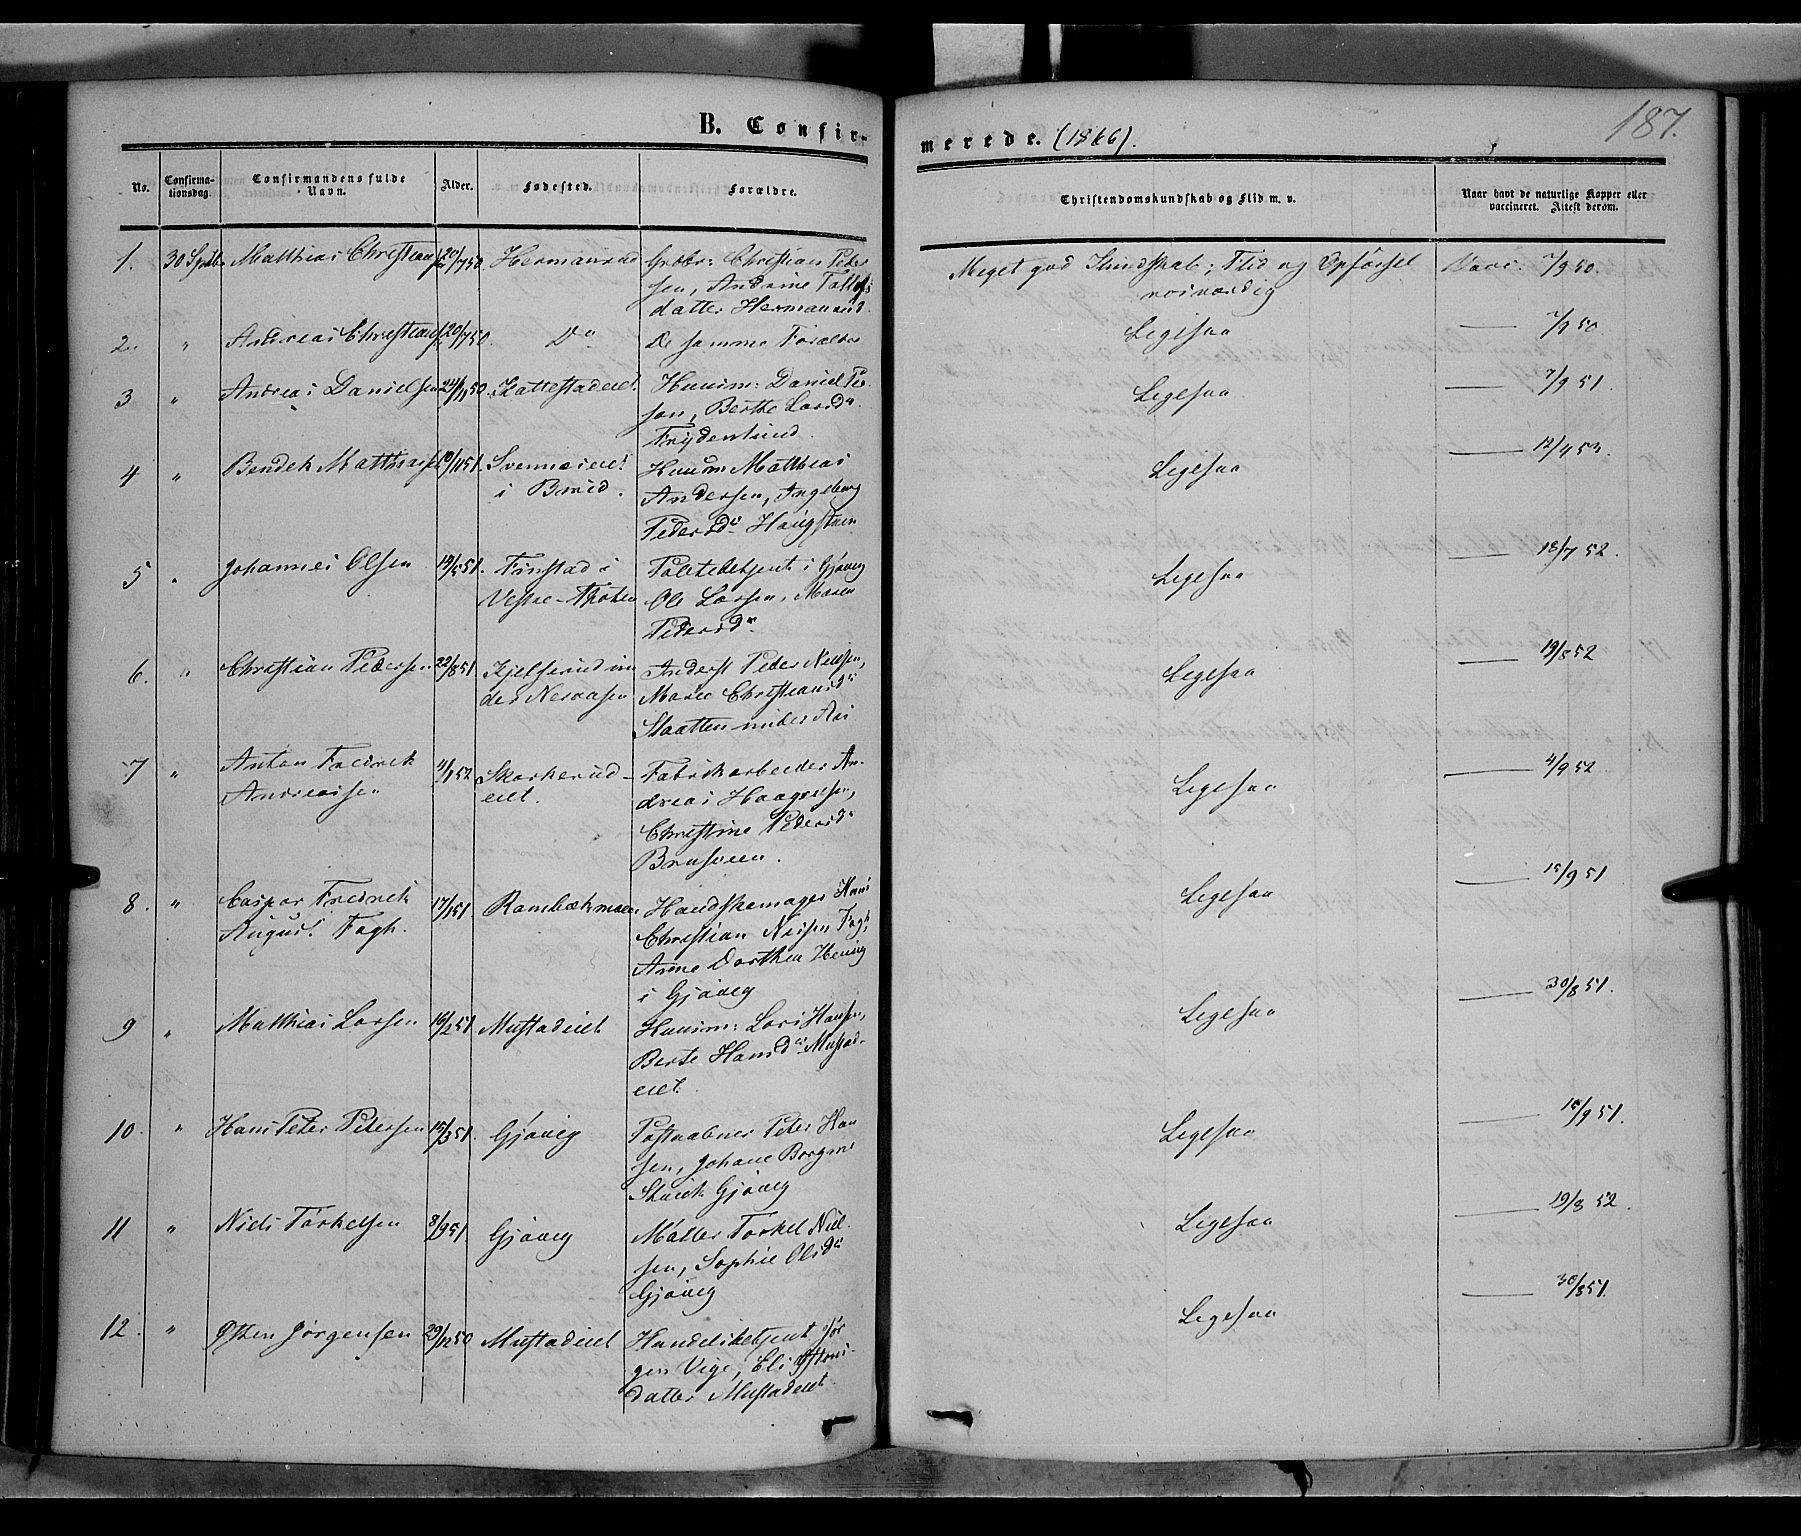 SAH, Vardal prestekontor, H/Ha/Haa/L0006: Ministerialbok nr. 6, 1854-1866, s. 187